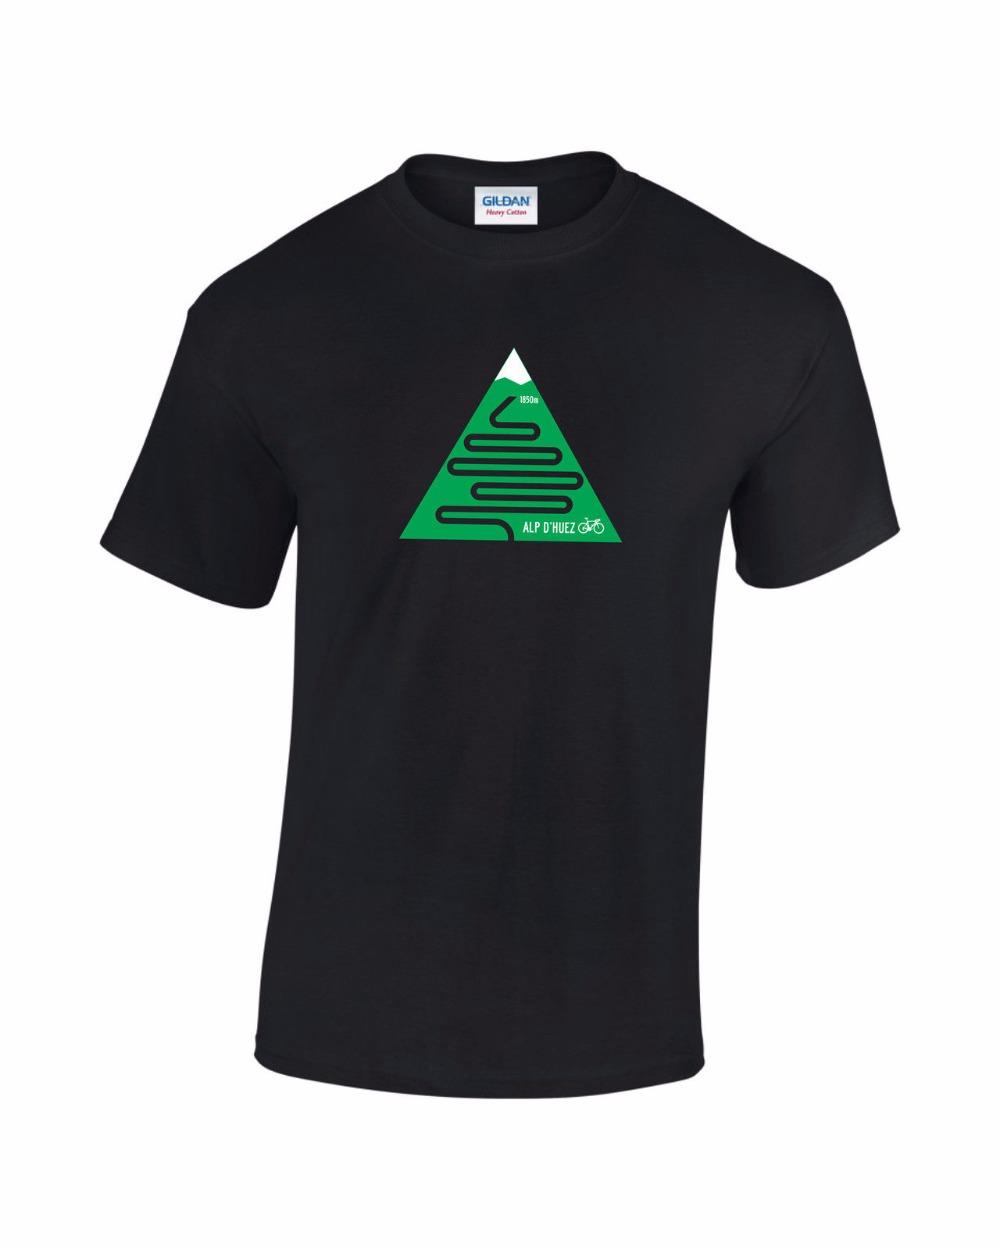 Shirt design green - T Shirt Brand 2017 Male Short Sleeve Cool T Shirts Designs Best Selling Men Cycler Stage Tour De France Custom Shirt Design